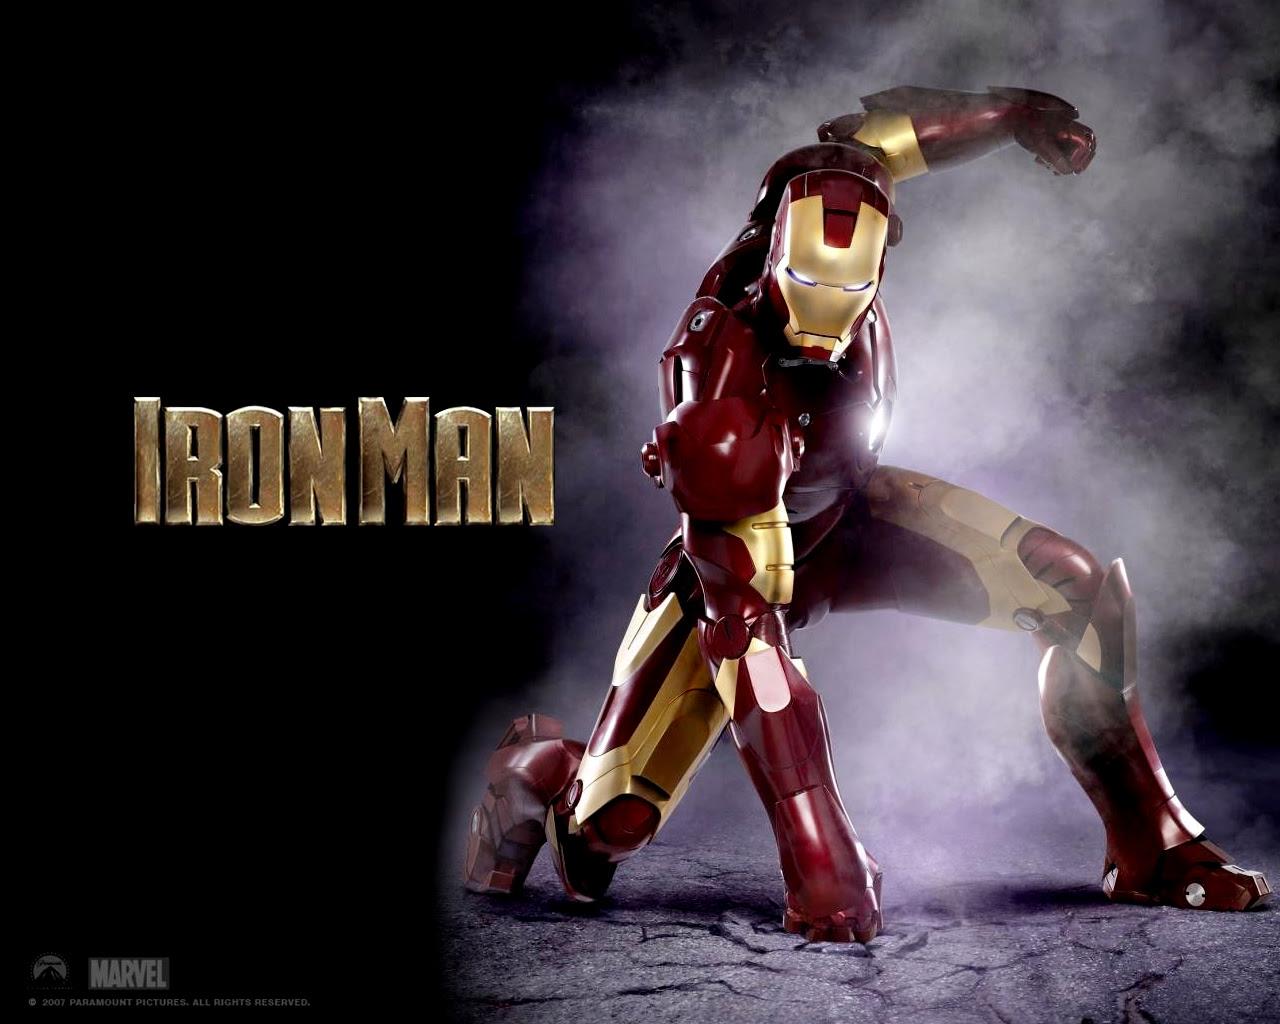 Iron Man 2 Hd Wallpapers